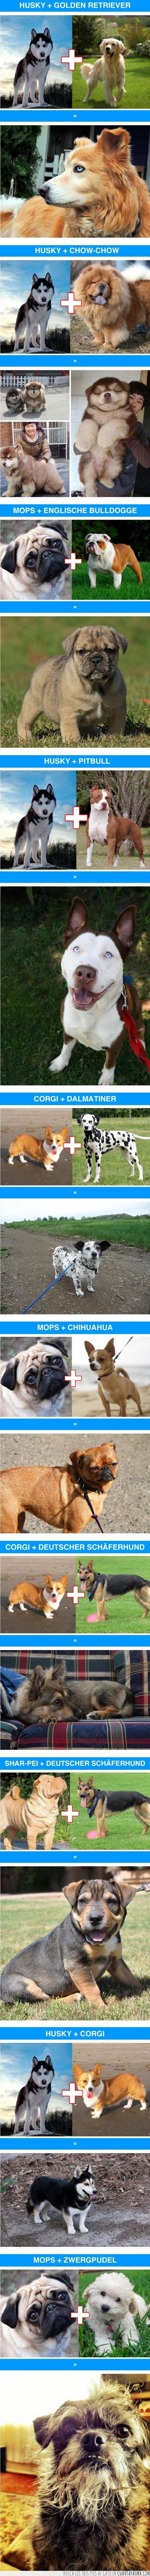 chihuahua,corgi,dalmata,golden retriever,husky,mixta,pastor aleman,perro,pitbull,pug,raza